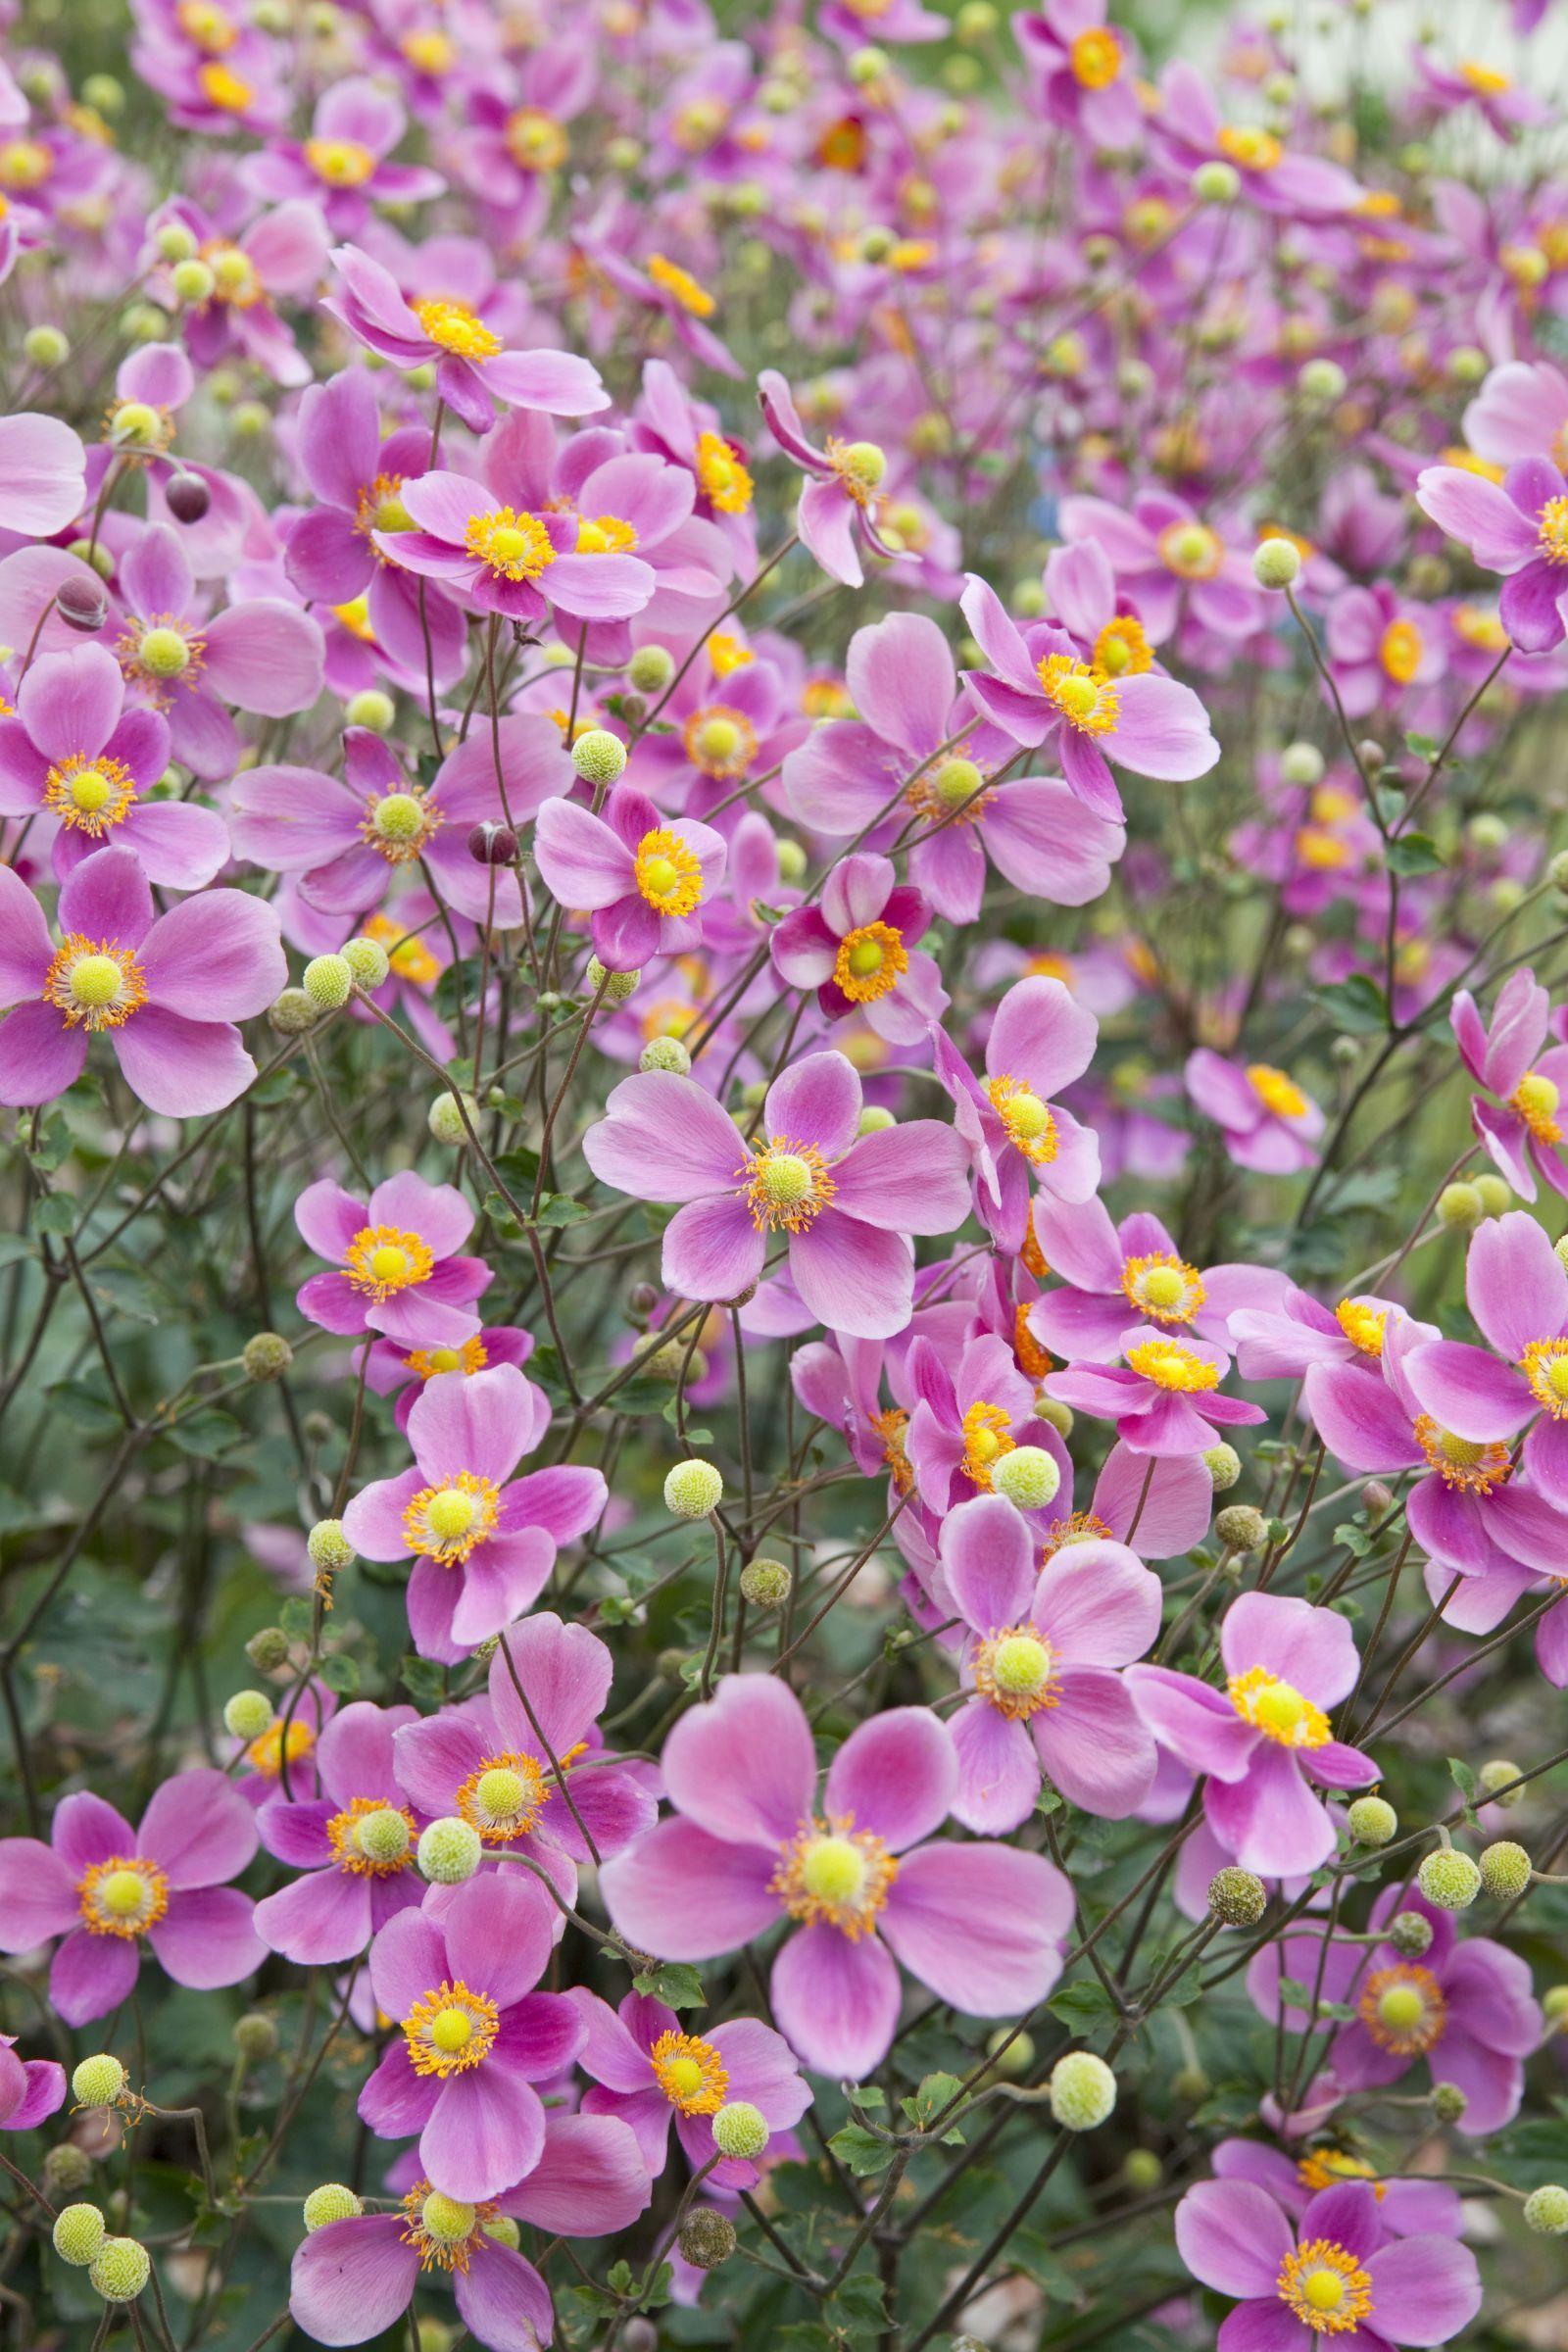 20 Fall Flowers And Plants For An Autumn Garden #Gardenplants